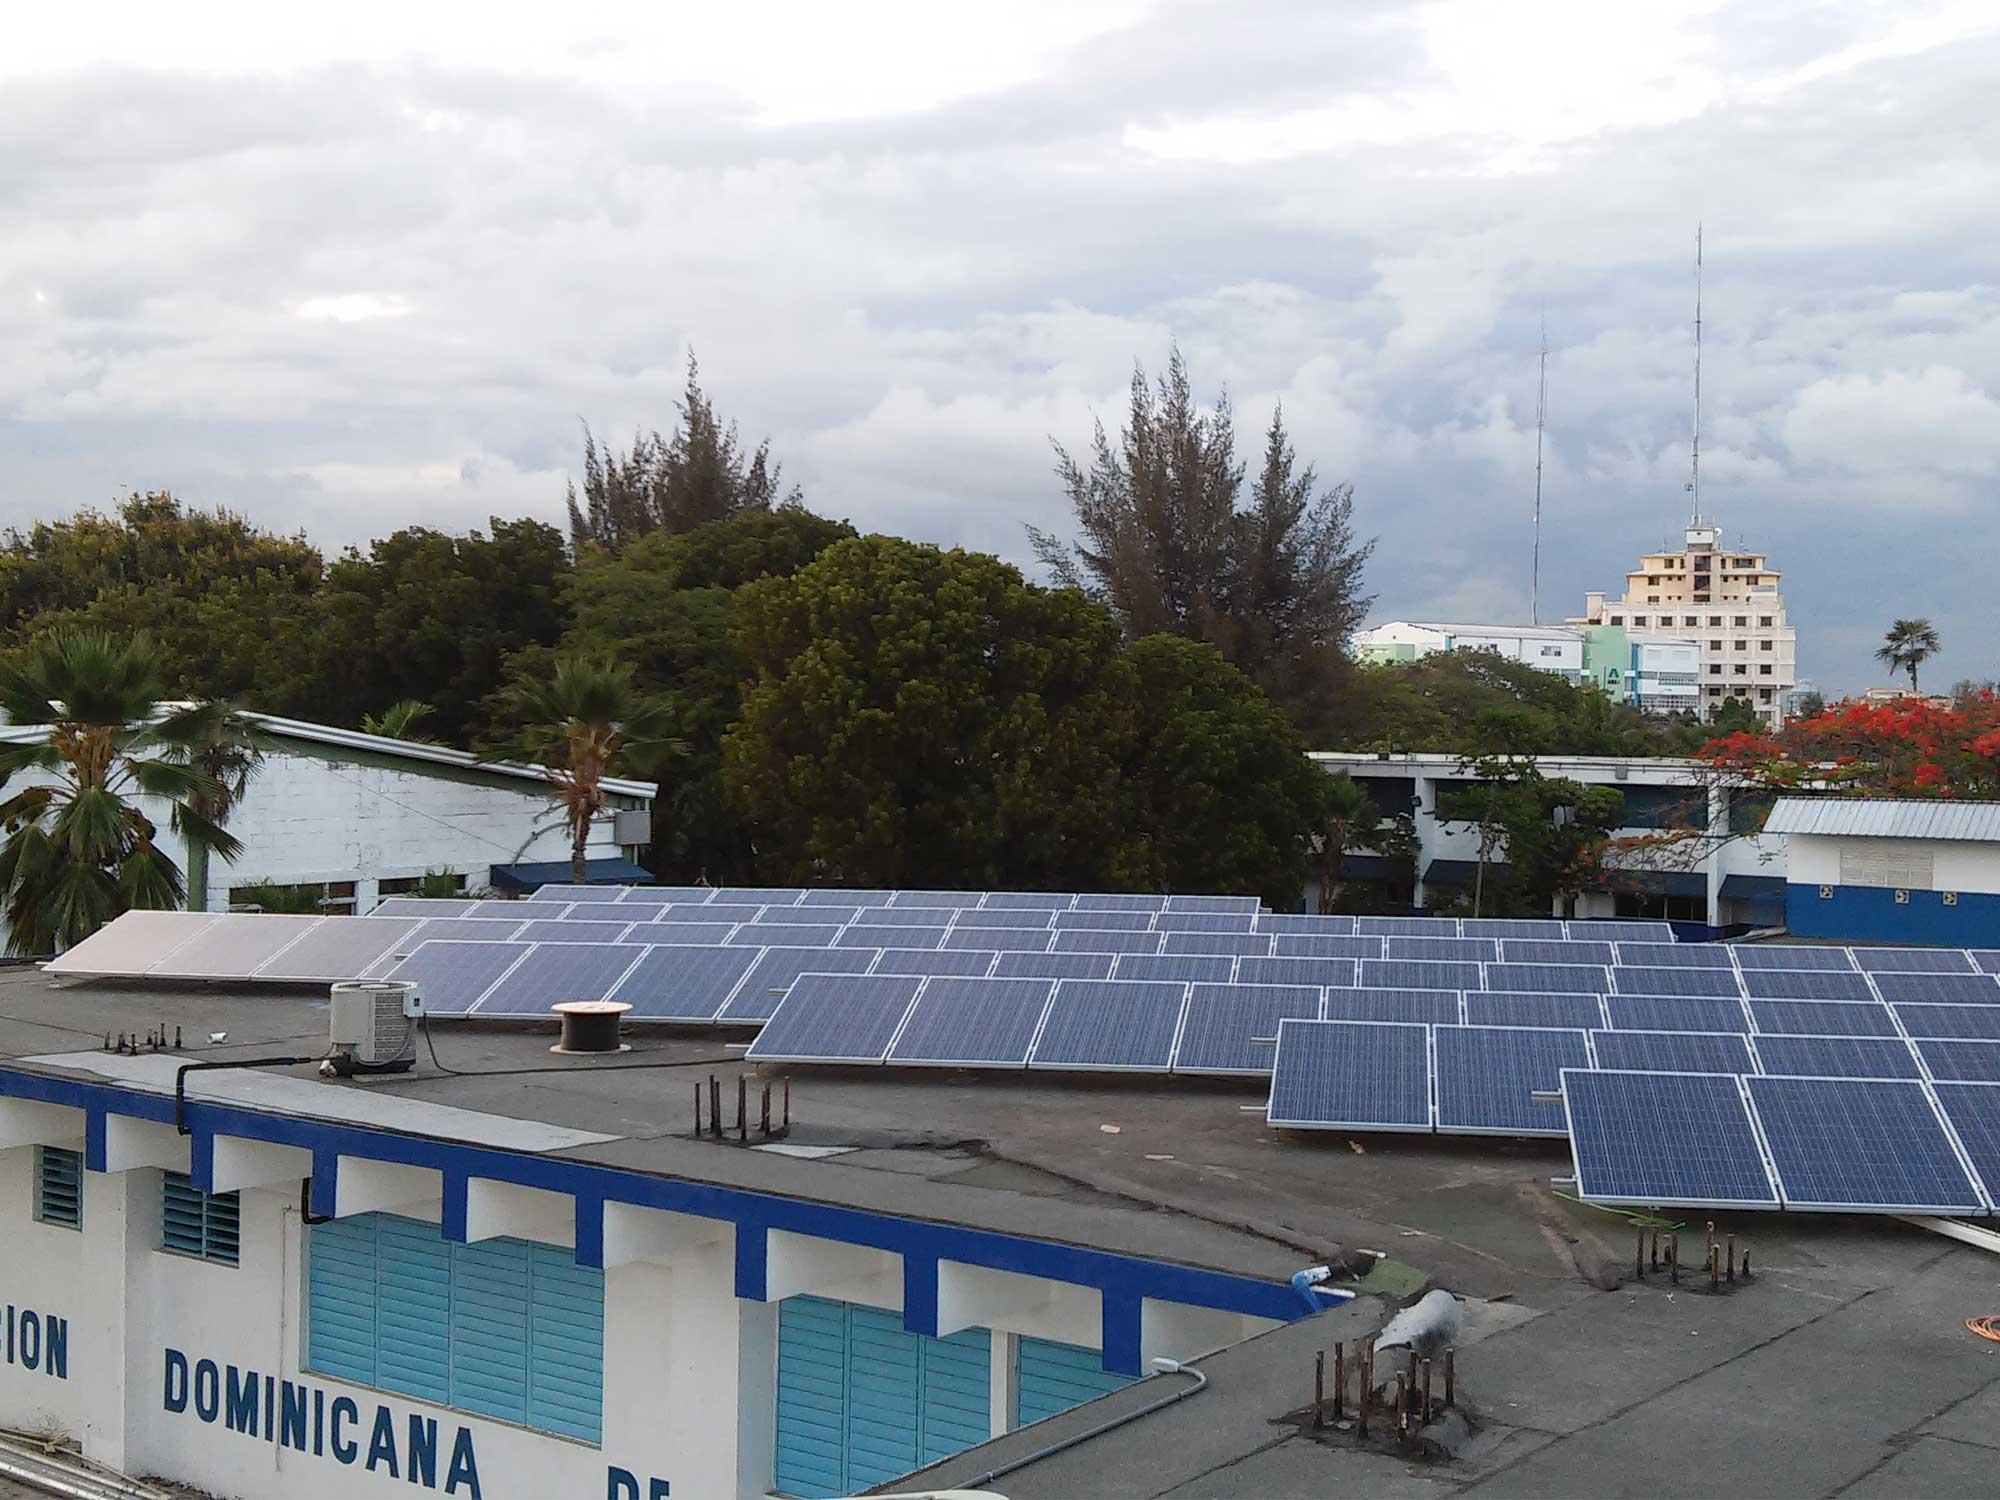 ADR Asoc. Dominicana de Rehabilitación